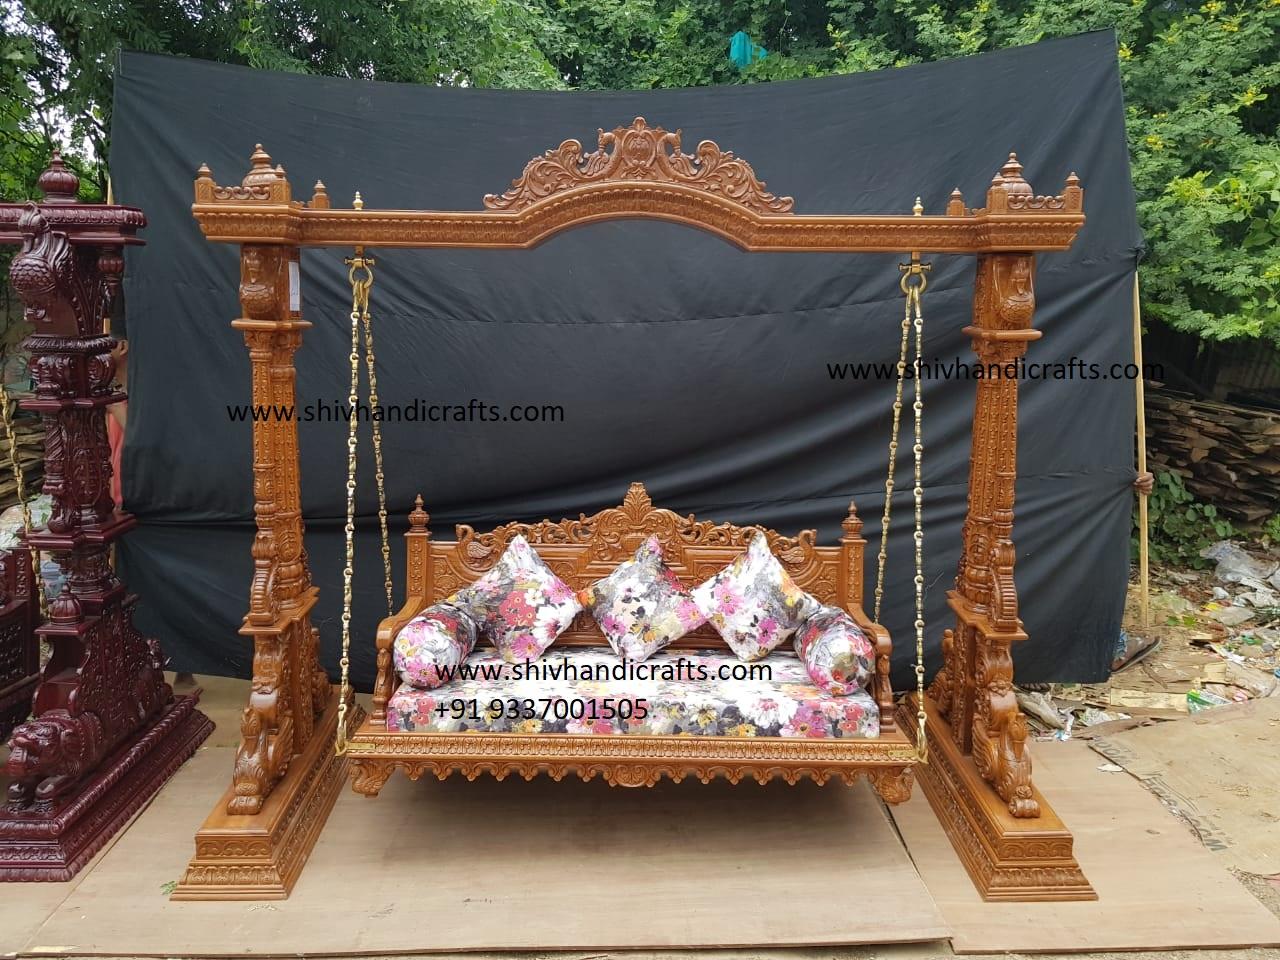 Indoor Handcrafted Wooden Three Seater Swing